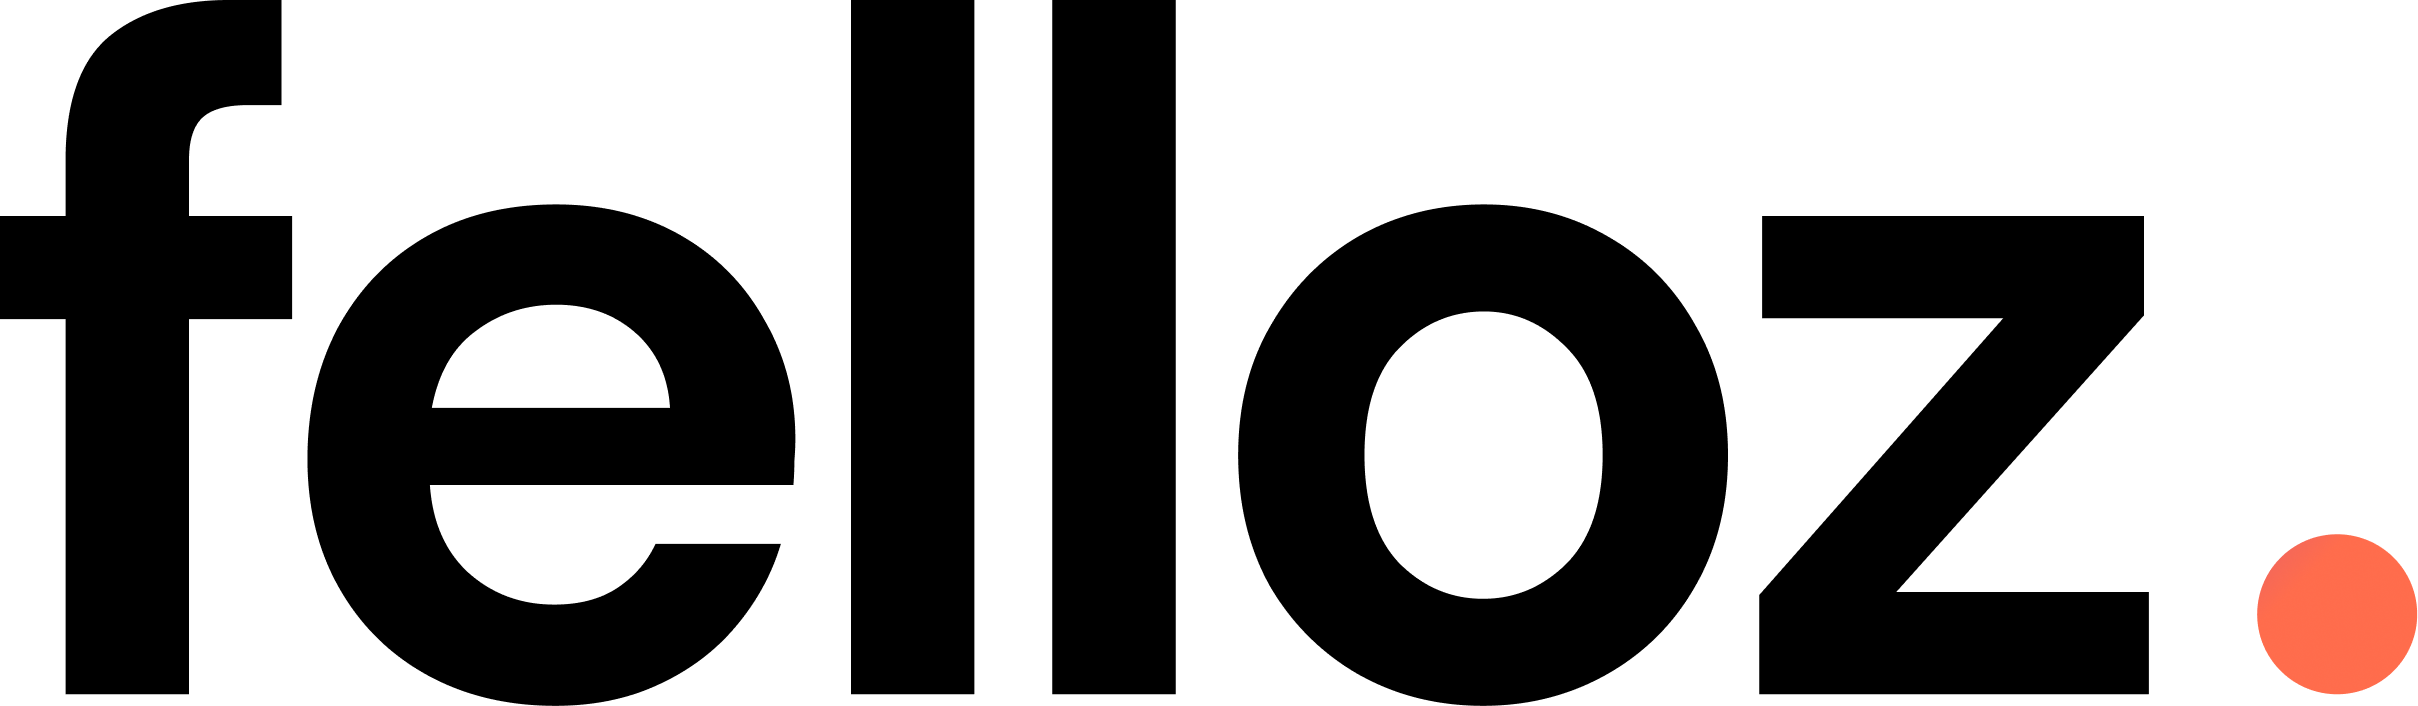 Felloz-logo